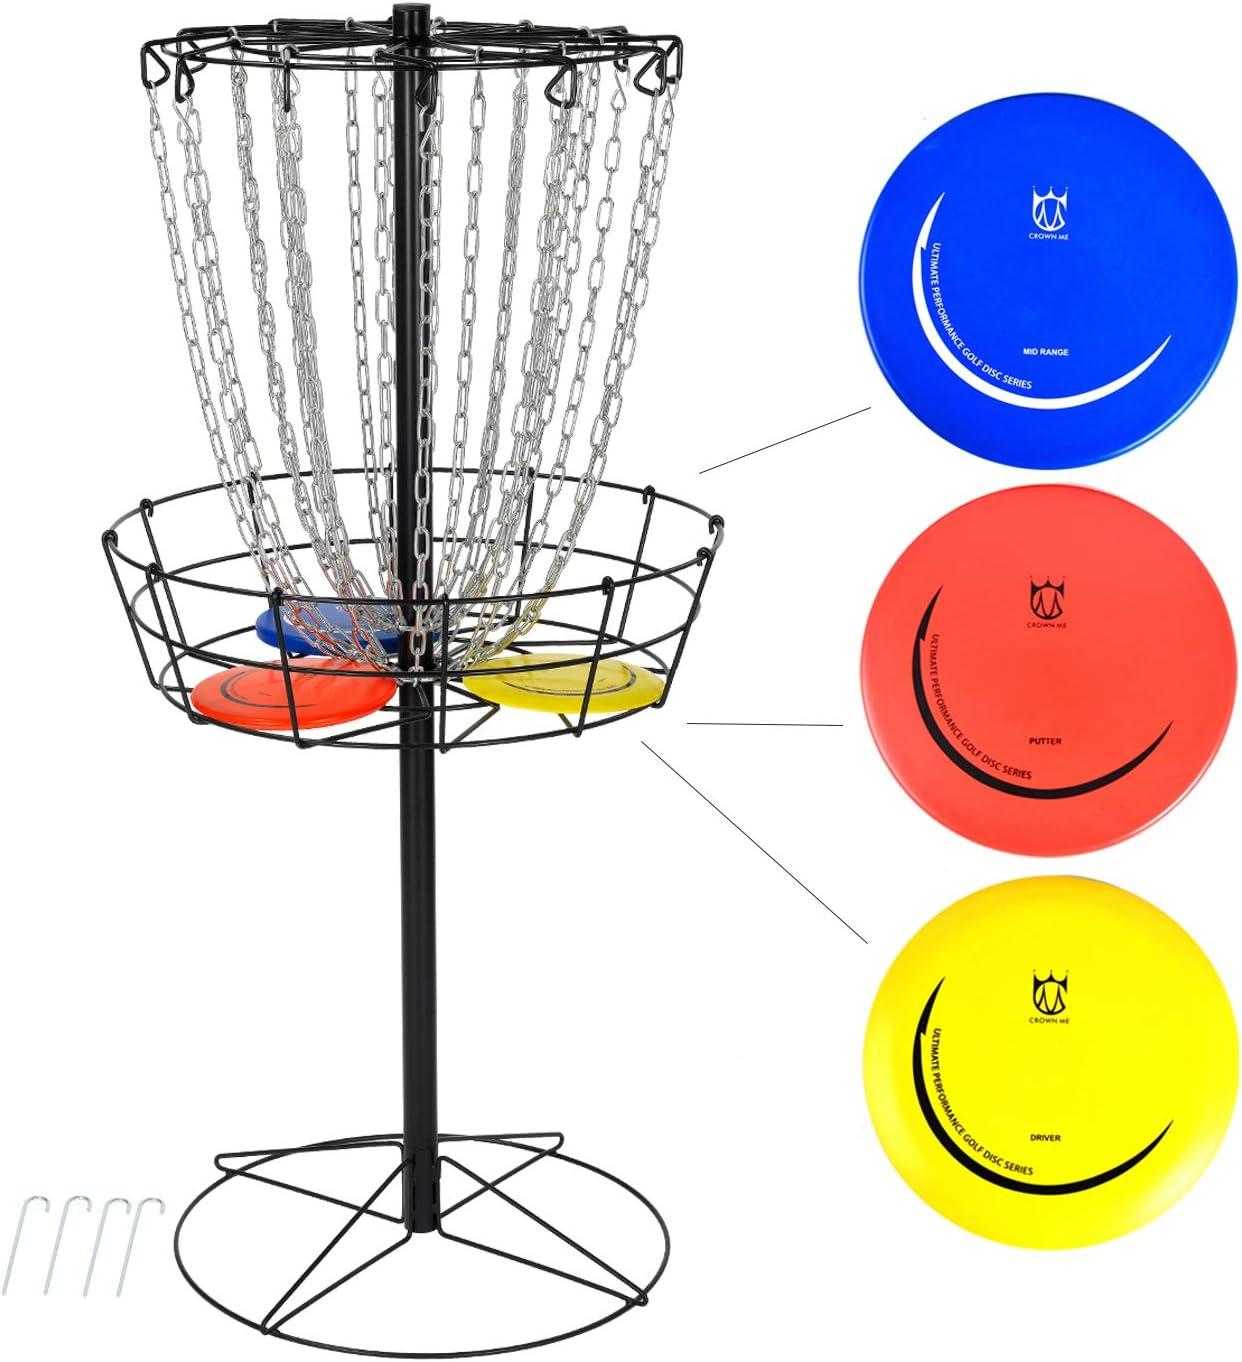 CROWN ME Disc Golf Basket Target Include 3 Discs, 24-Chain Portable Metal Golf Goals Baskets,Frisbee Golf Basket